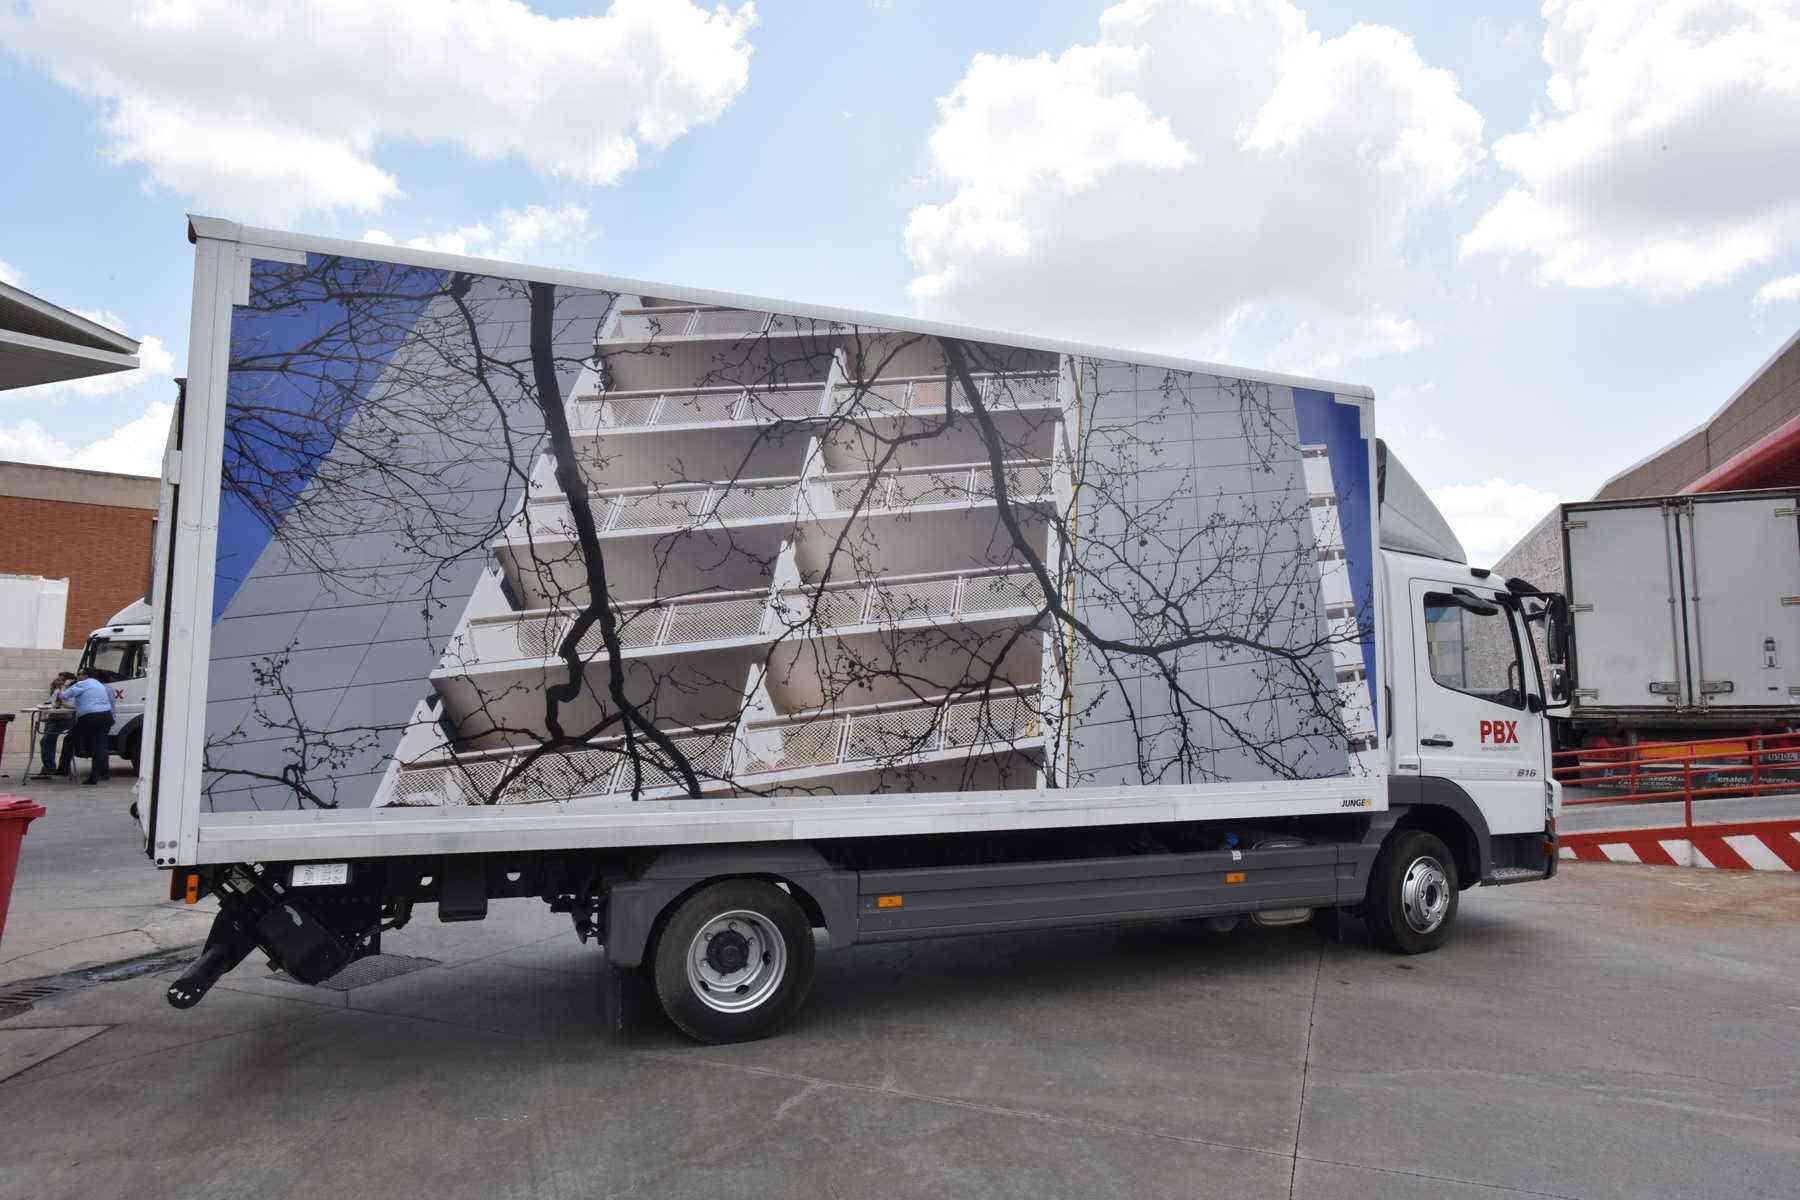 TruckArtProject-Celia-Macias